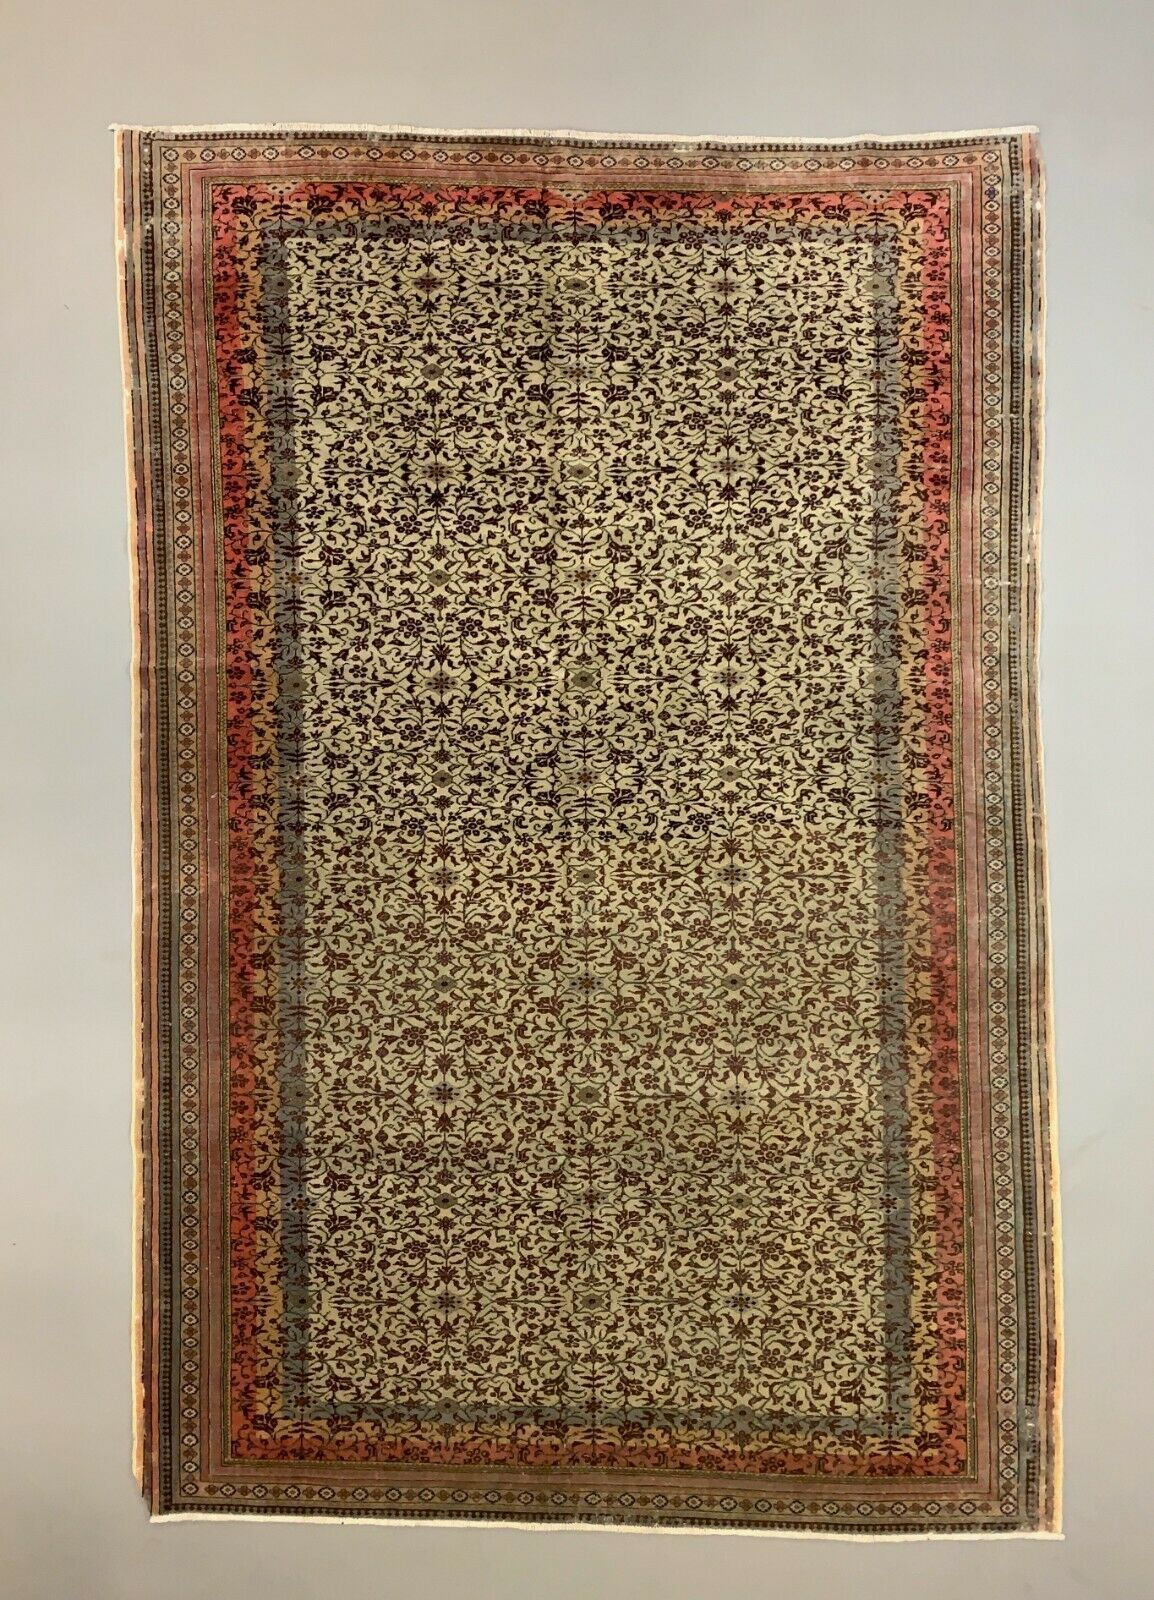 Large Distressed Turkish Rug 290x190 Cm Wool Hand Knotted Vintage Tribal Beige Unknown Vinterior